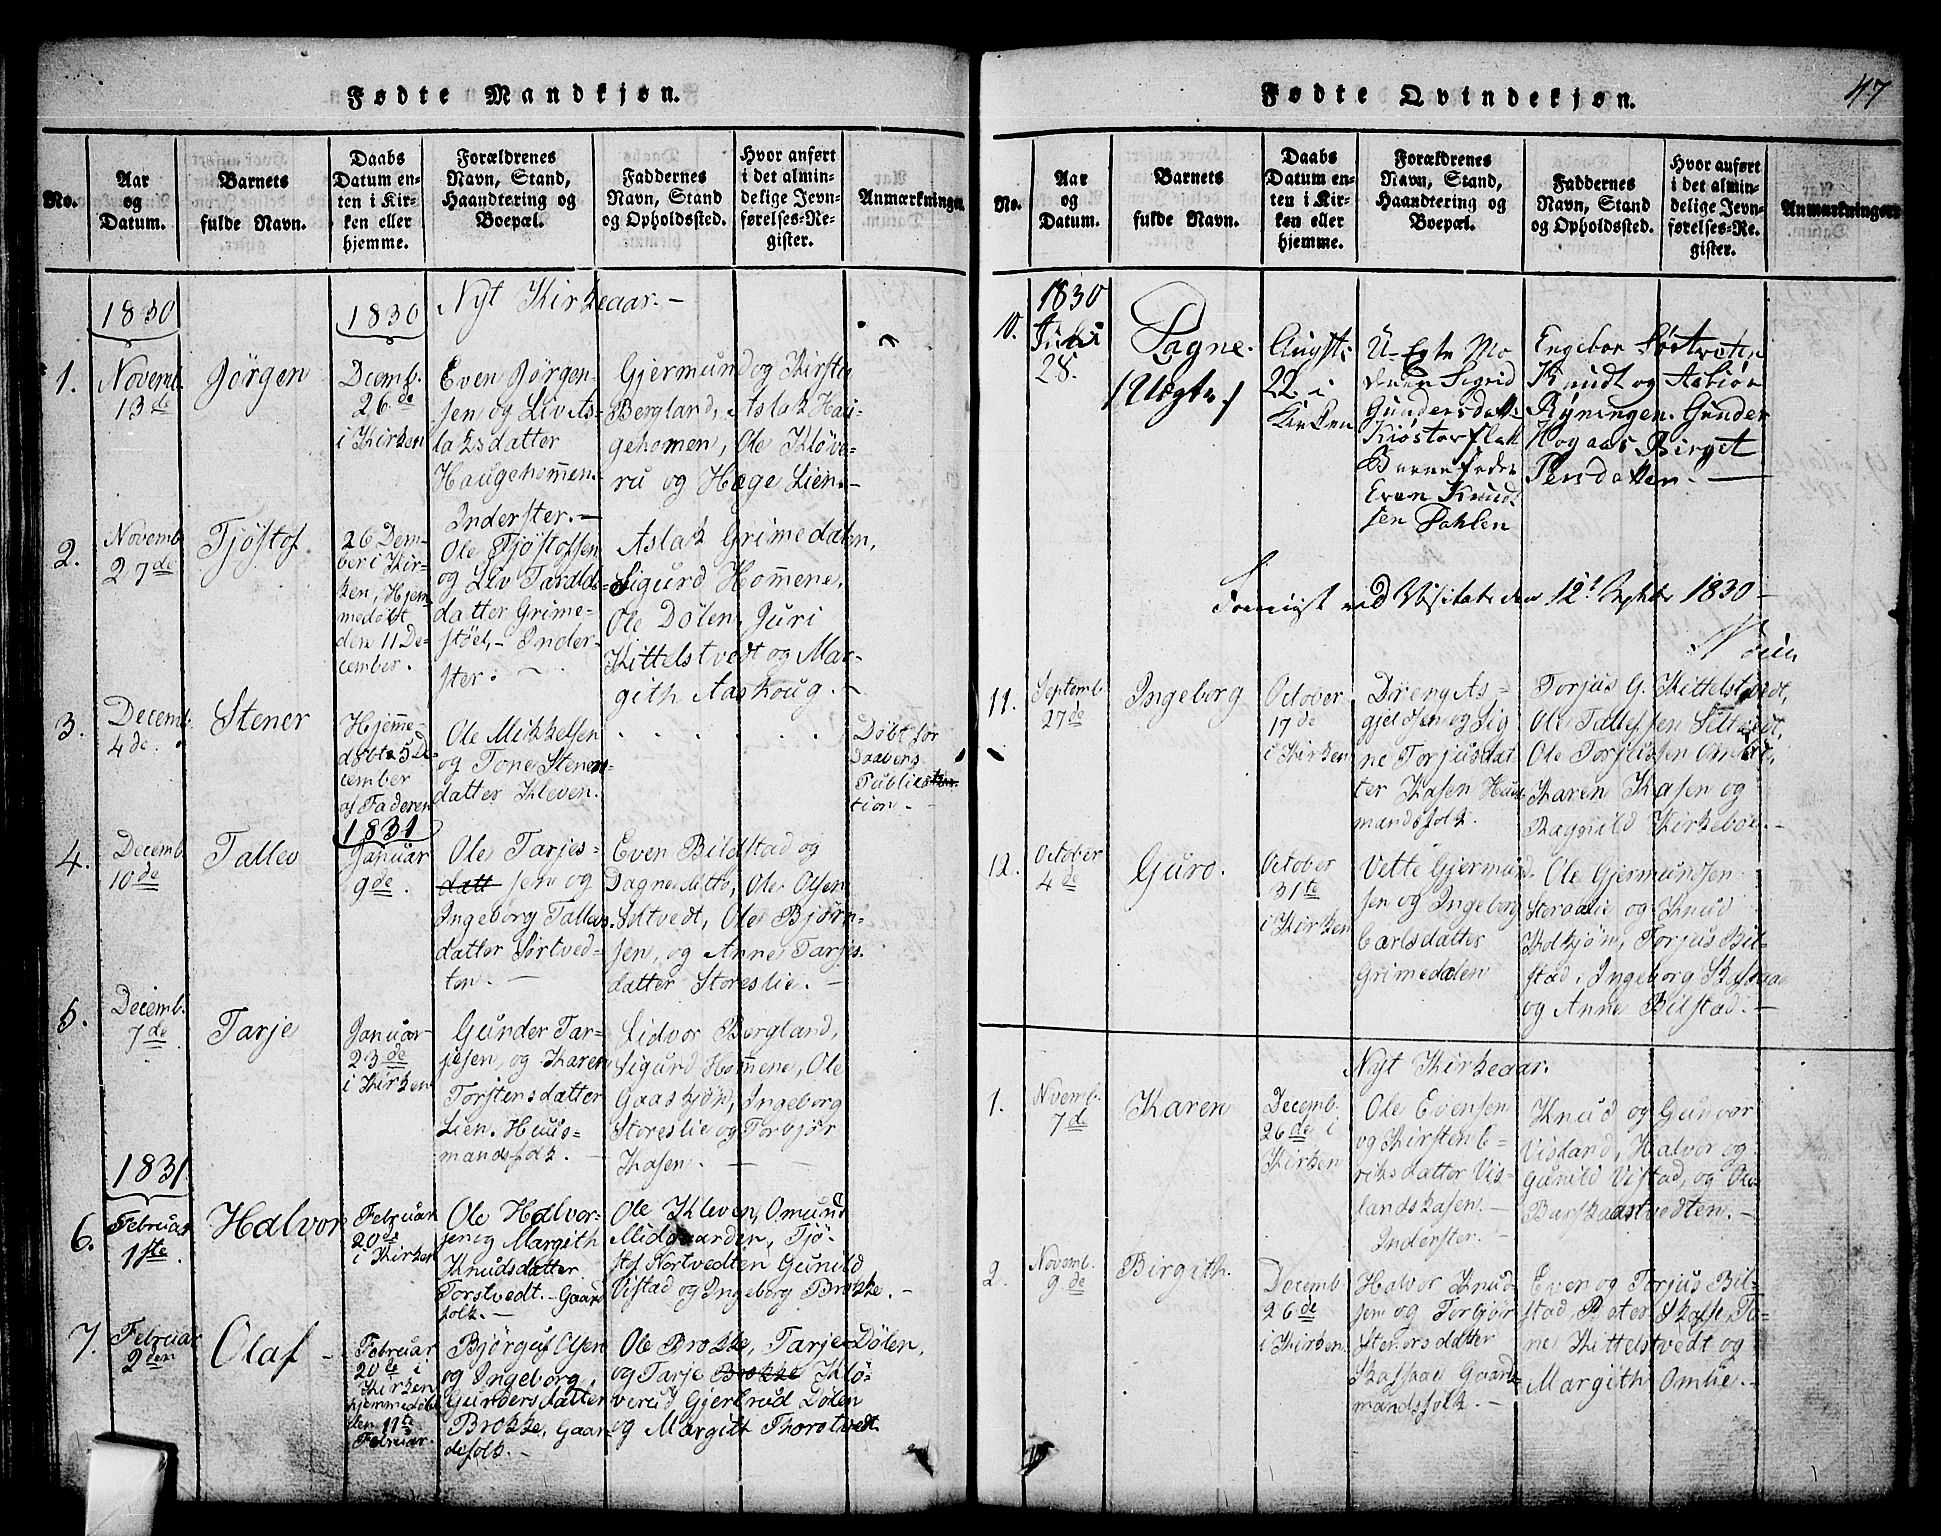 SAKO, Mo kirkebøker, G/Gb/L0001: Klokkerbok nr. II 1, 1814-1843, s. 47